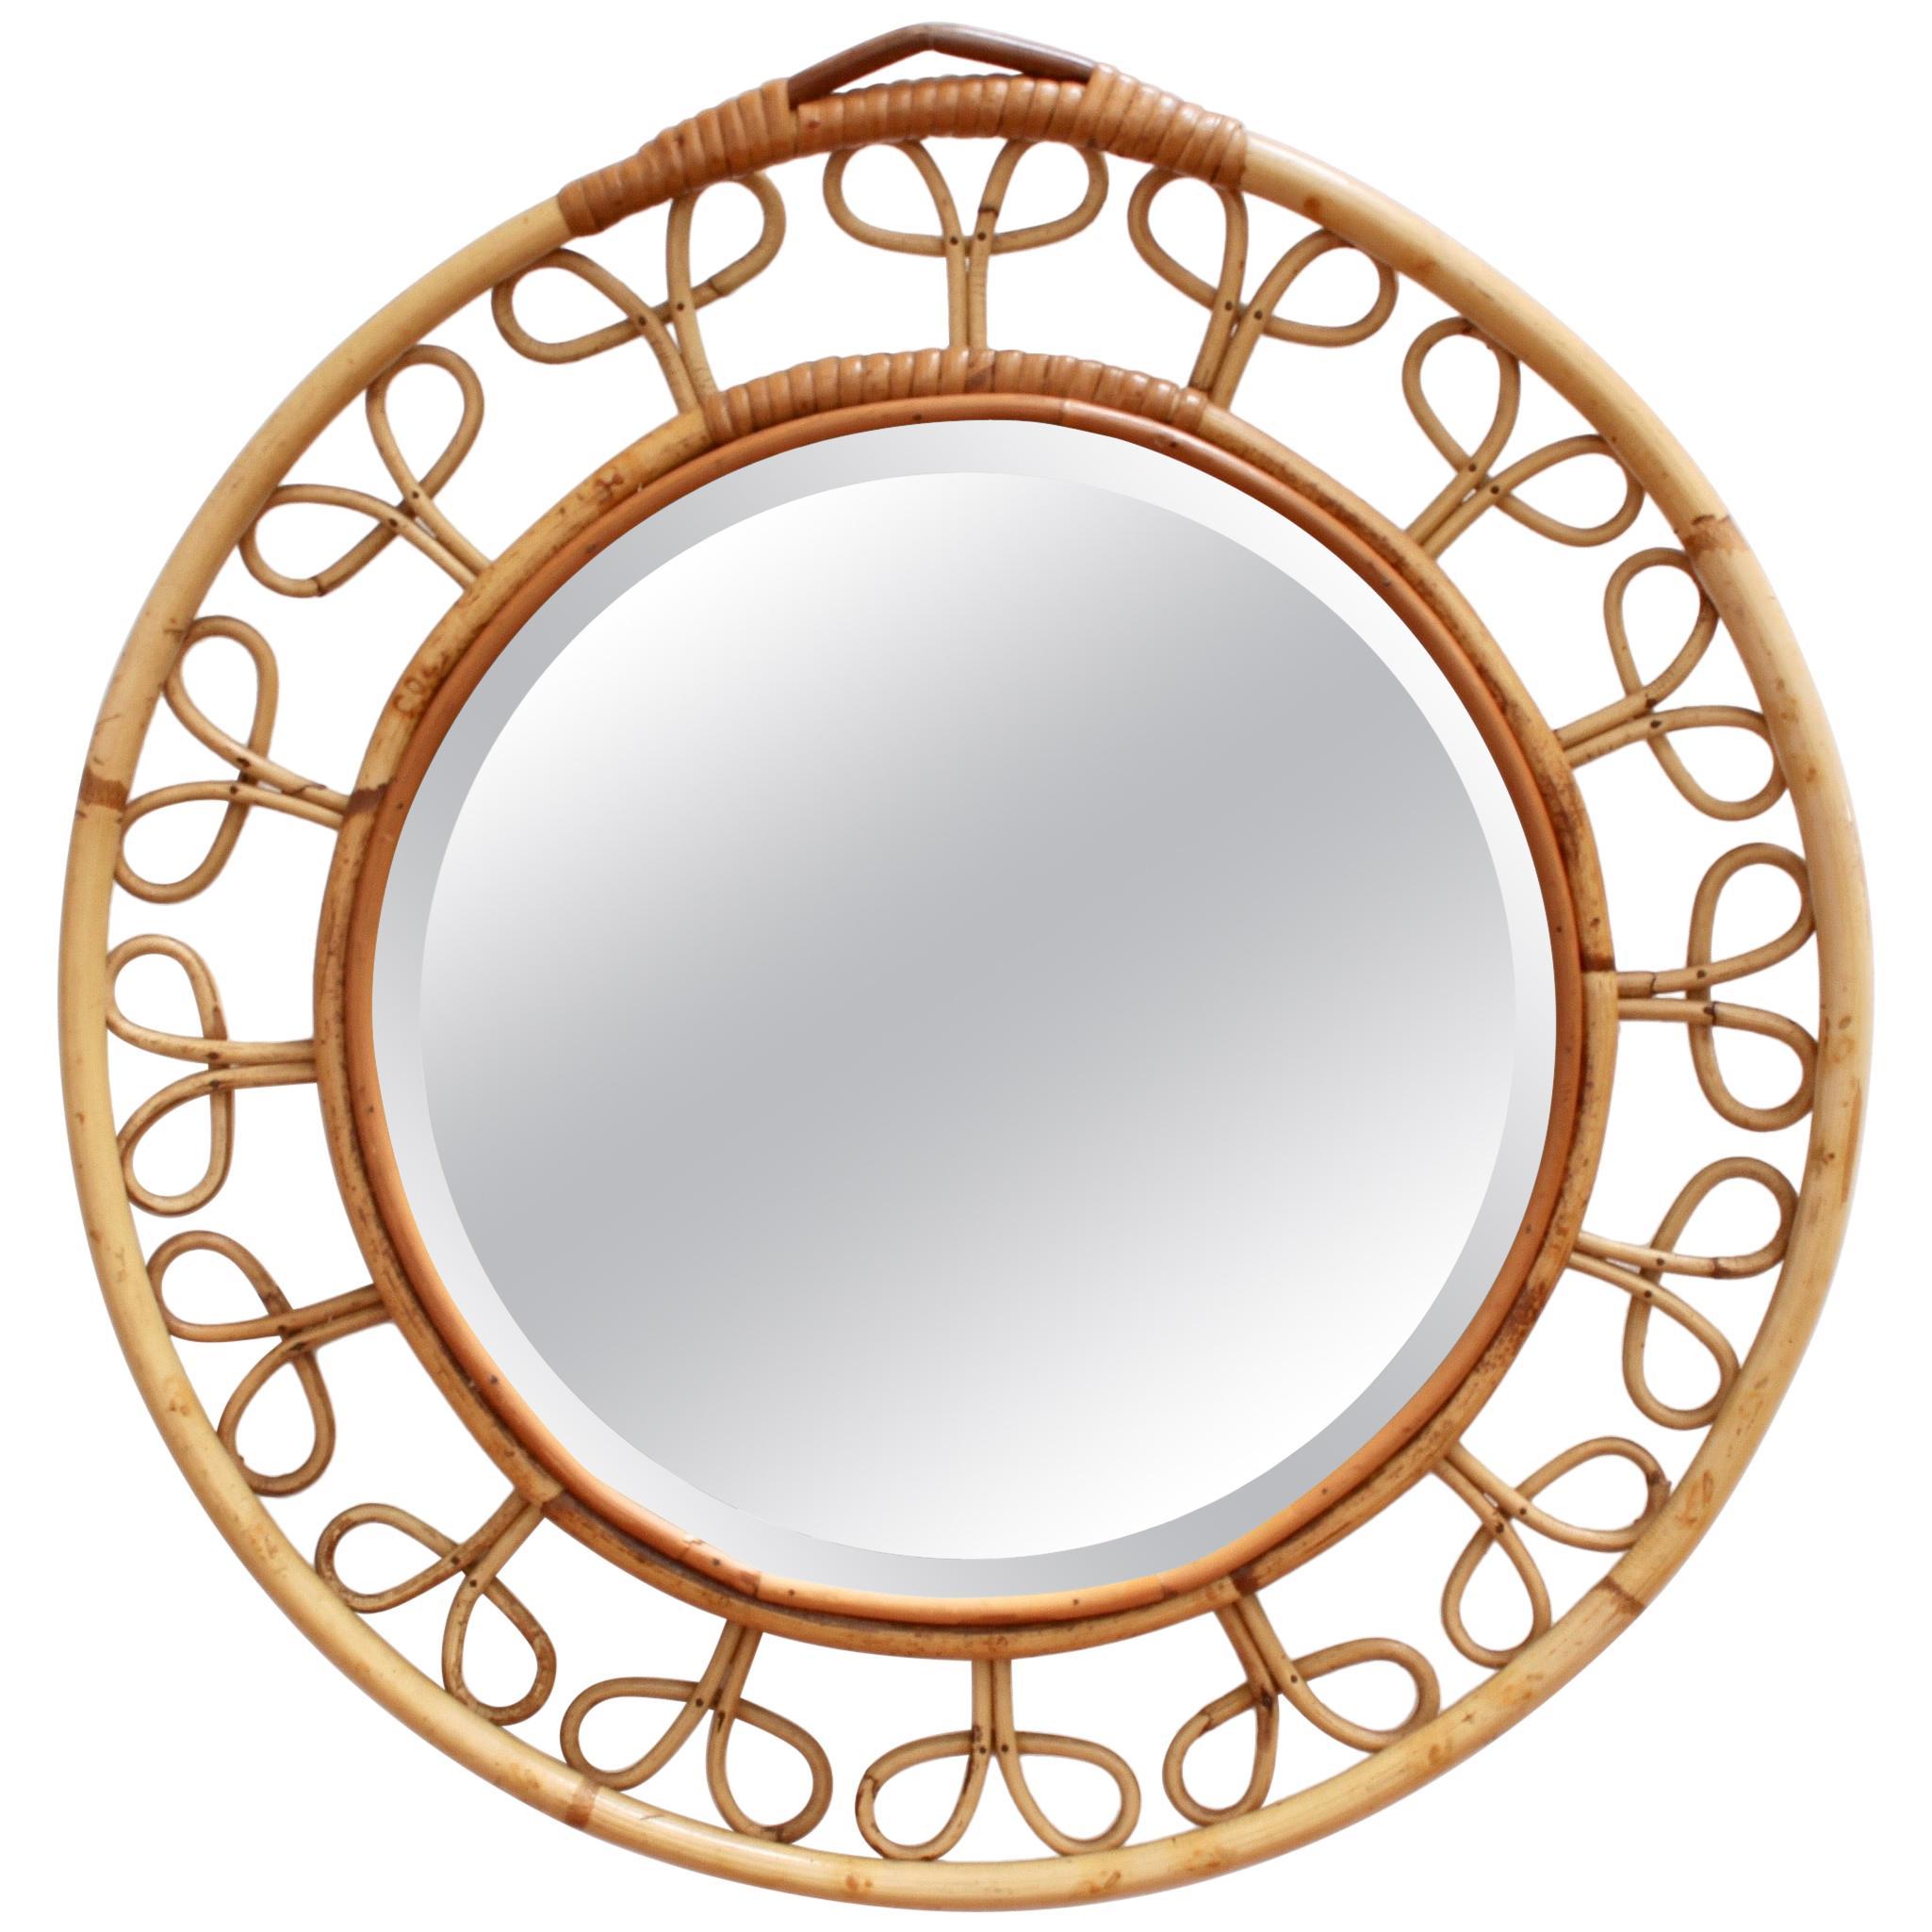 Midcentury French Rattan Wall Mirror, circa 1960s